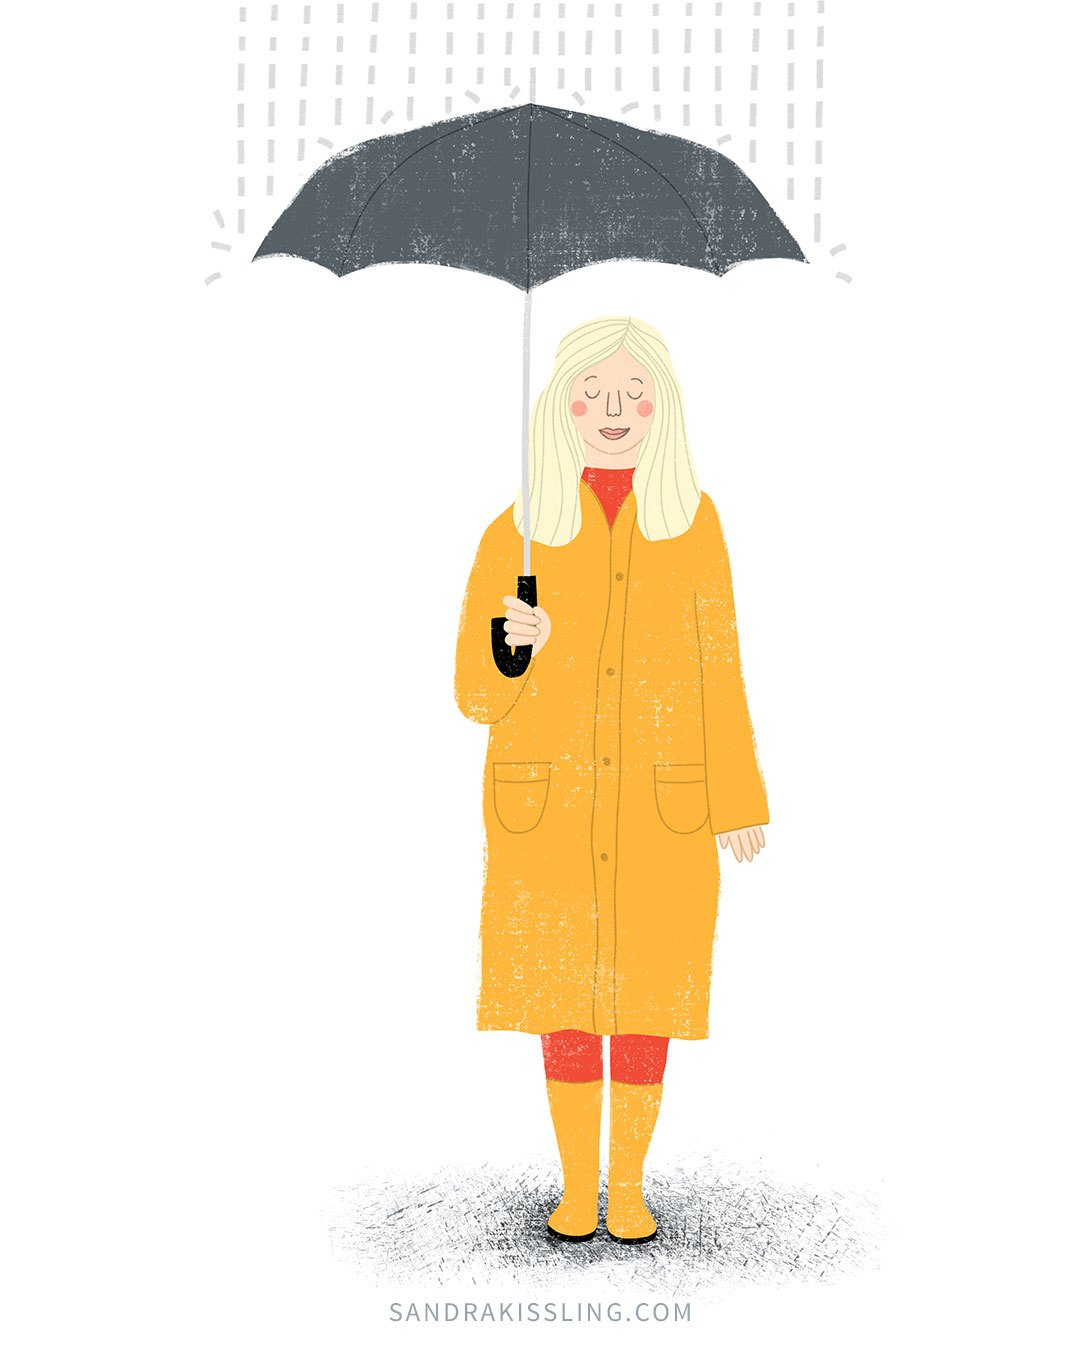 illustration-frau-mit-regenschirm.jpg